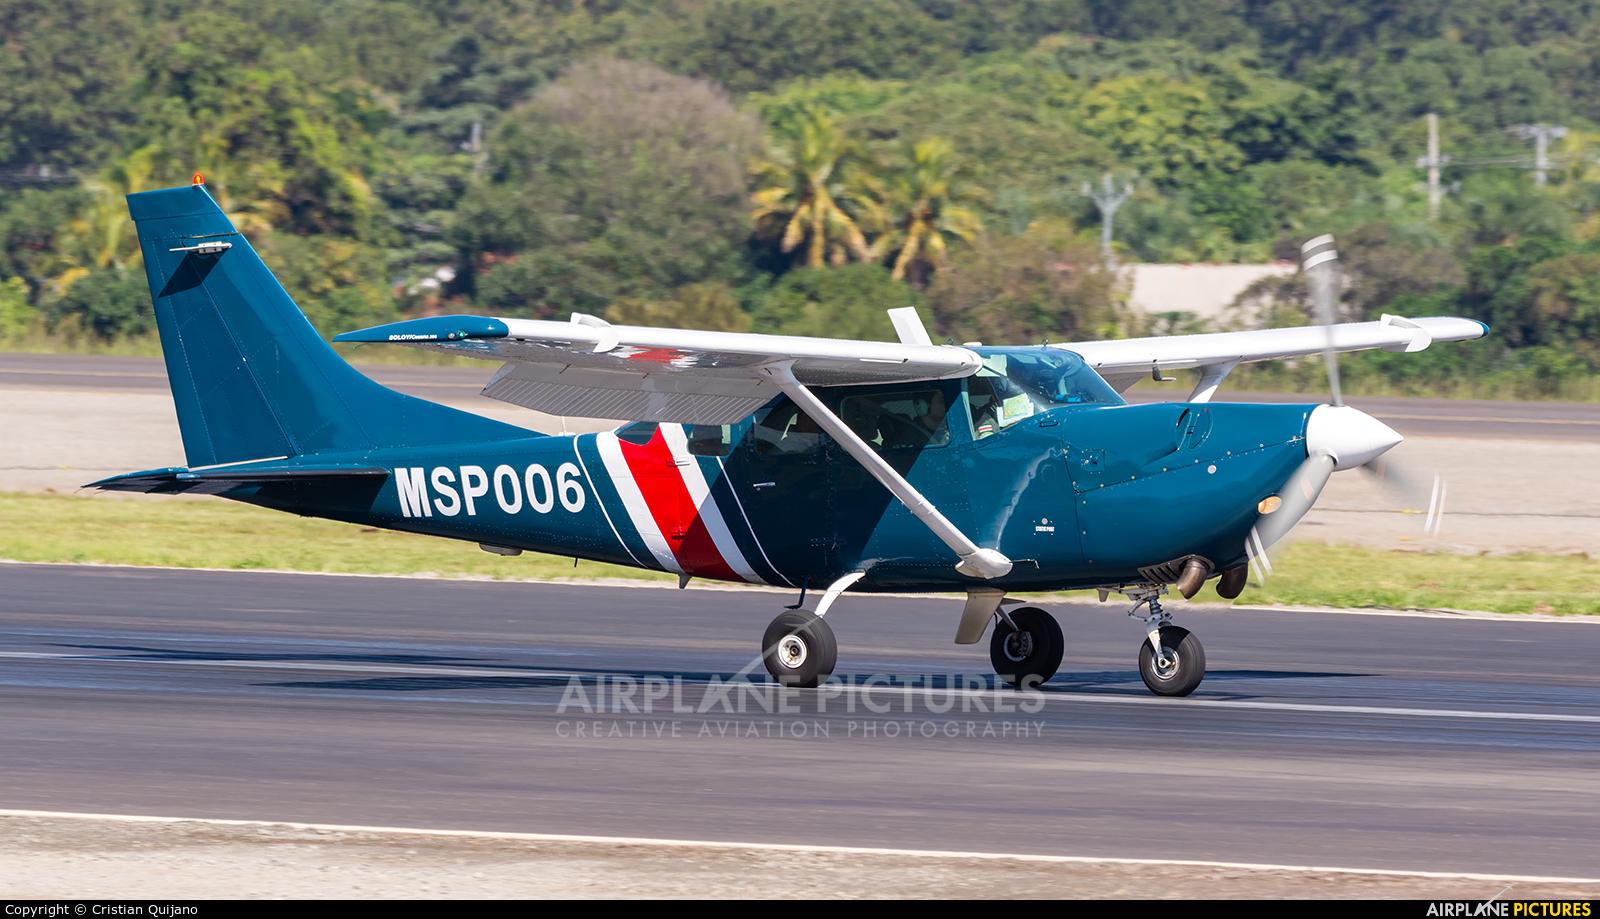 Costa Rica - Ministry of Public Security MSP006 aircraft at San Jose - Juan Santamaría Intl